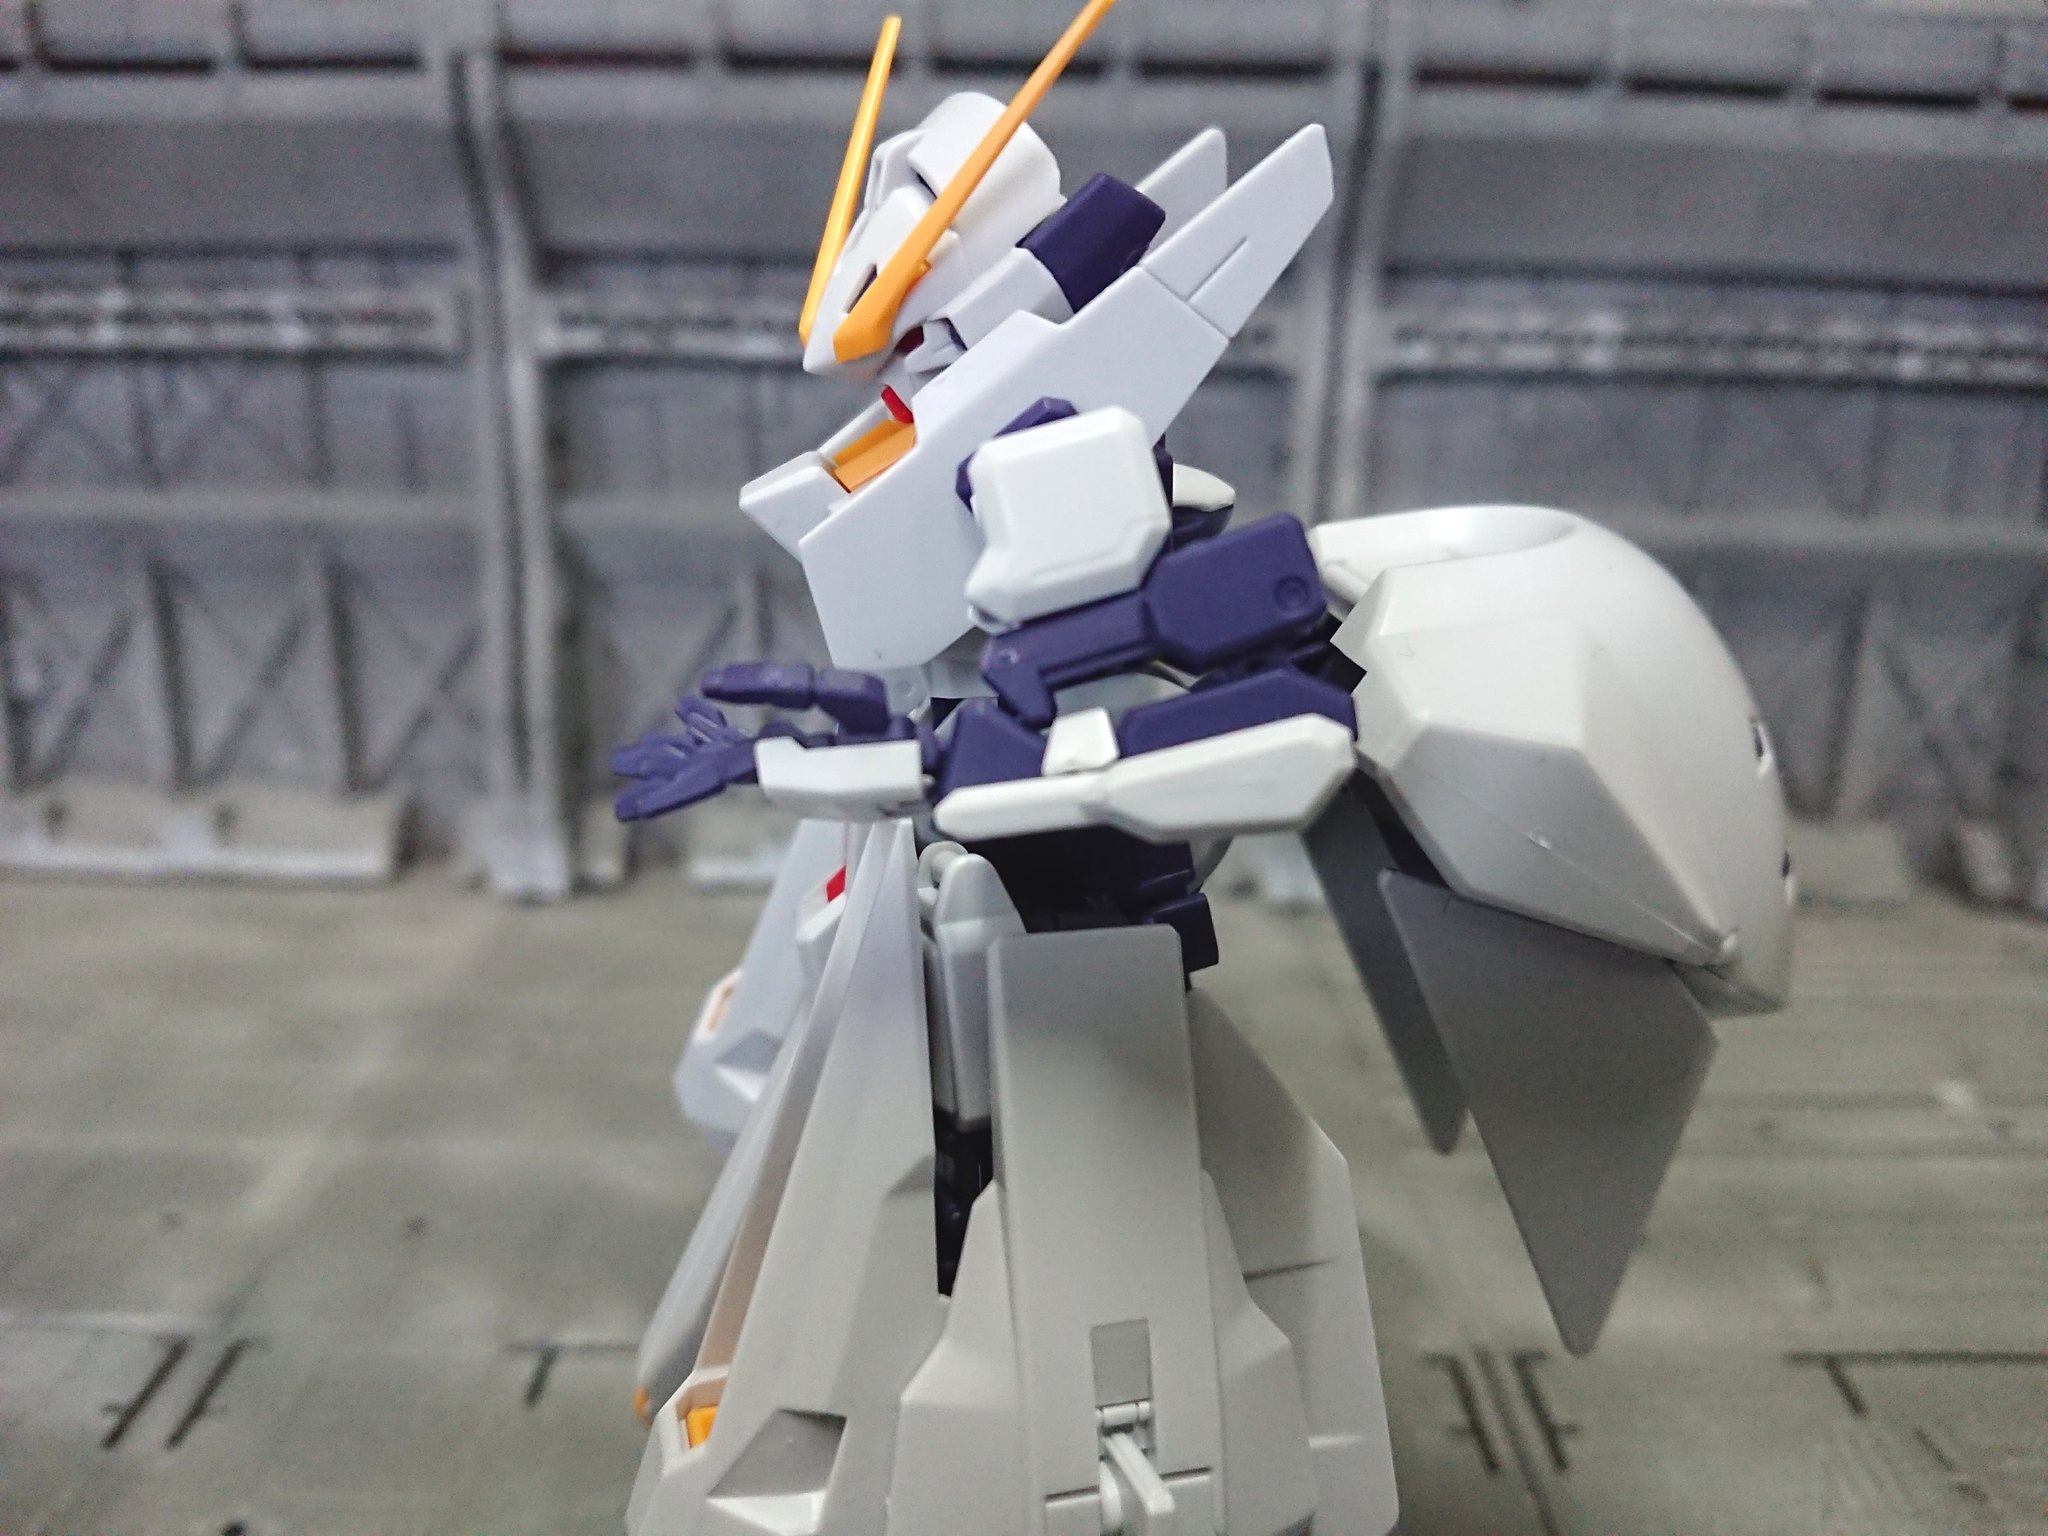 [Review Gunpla] HG1/144 TR-6 Woundwort กระต่ายน้อยเทพสงคราม